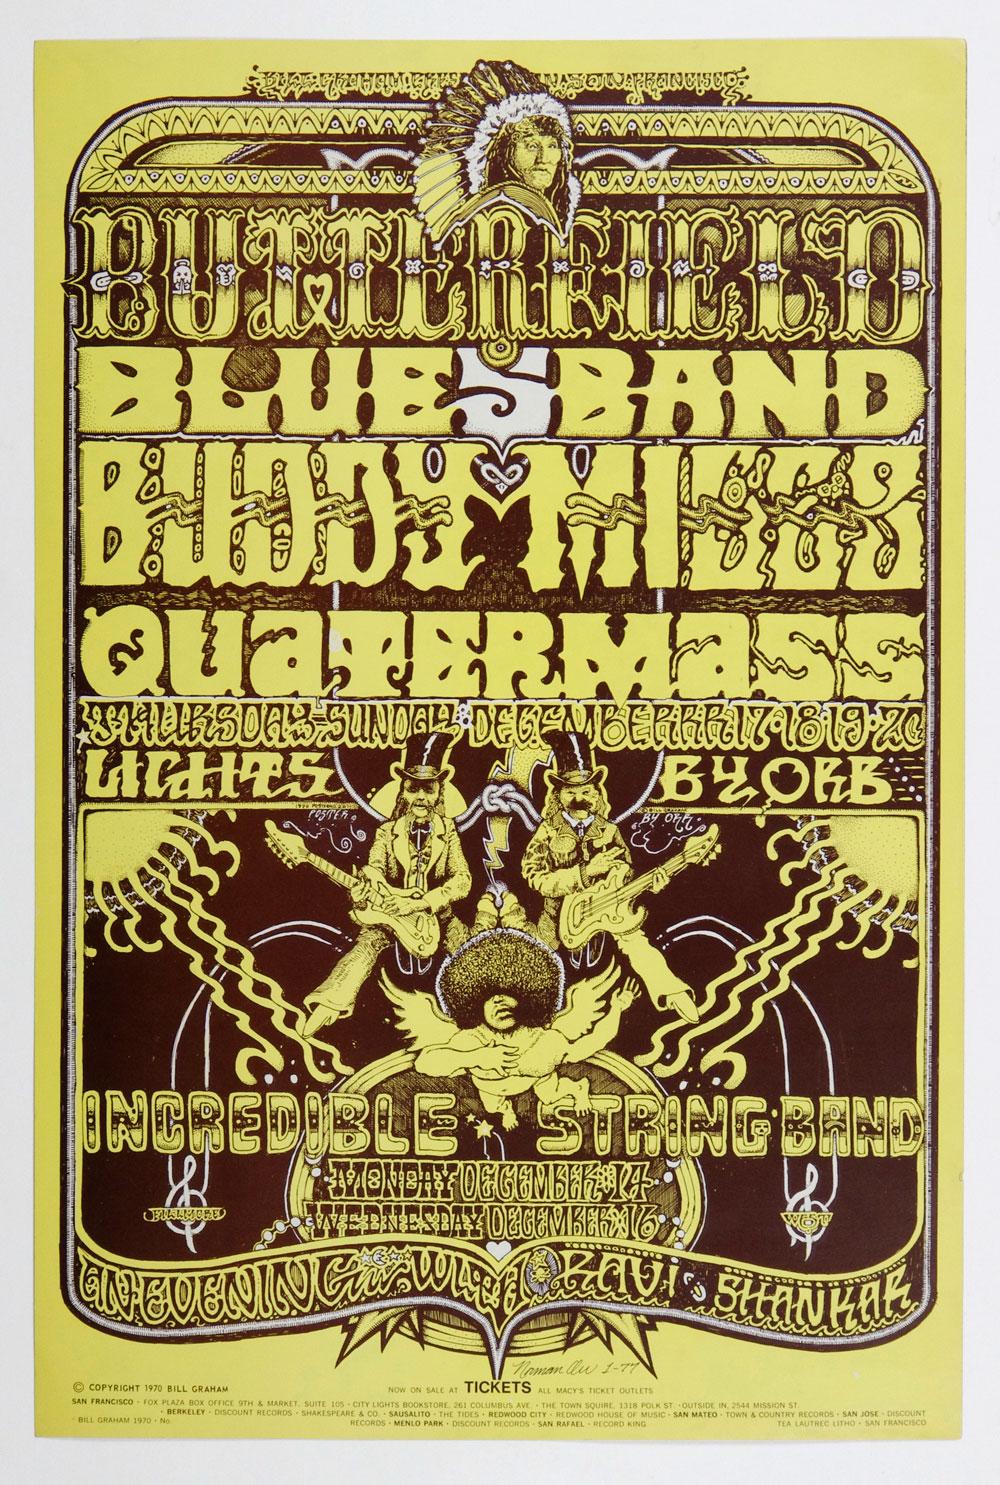 Bill Graham 261 Poster Norman Orr signed Incredible String Band Ravi Shankar 1970 Dec 14